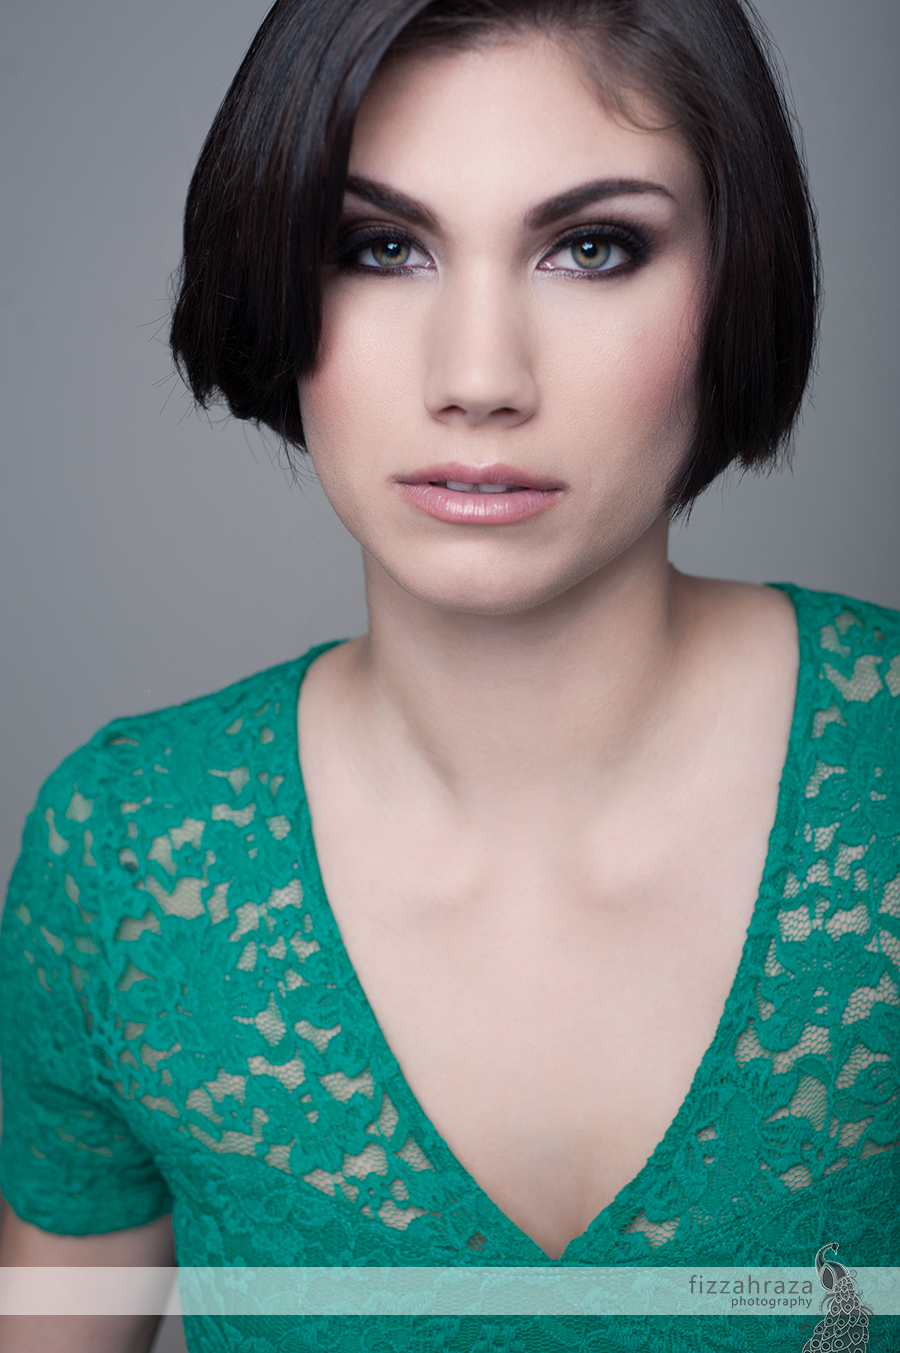 studio glamour portrait teal lace top green eyes san francisco